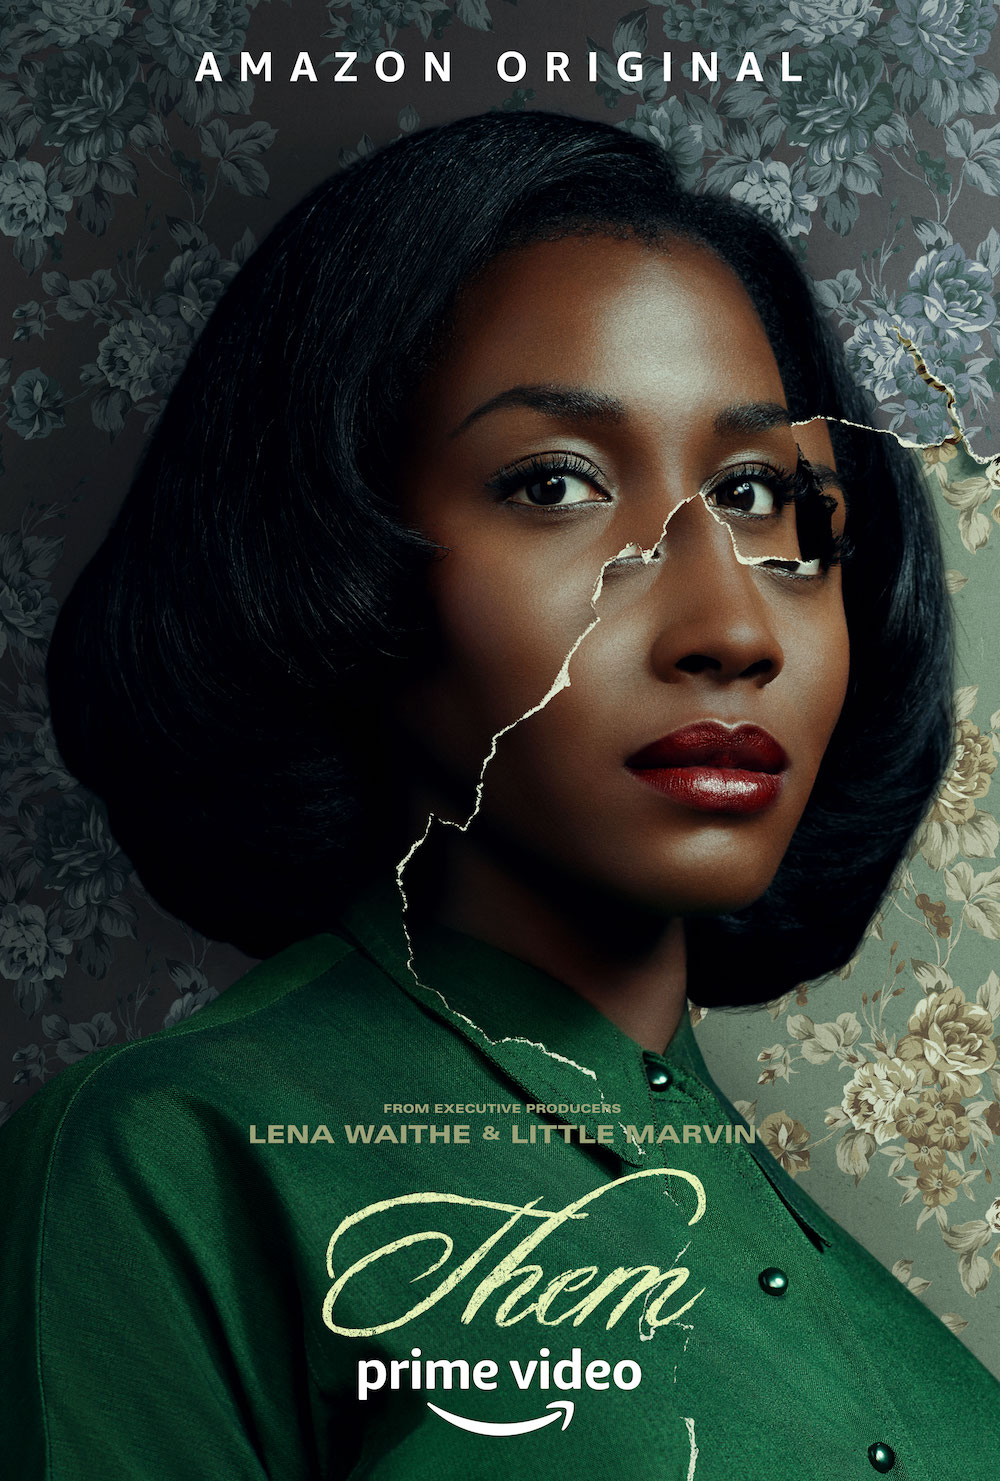 Them Poster Amazon Series TV show